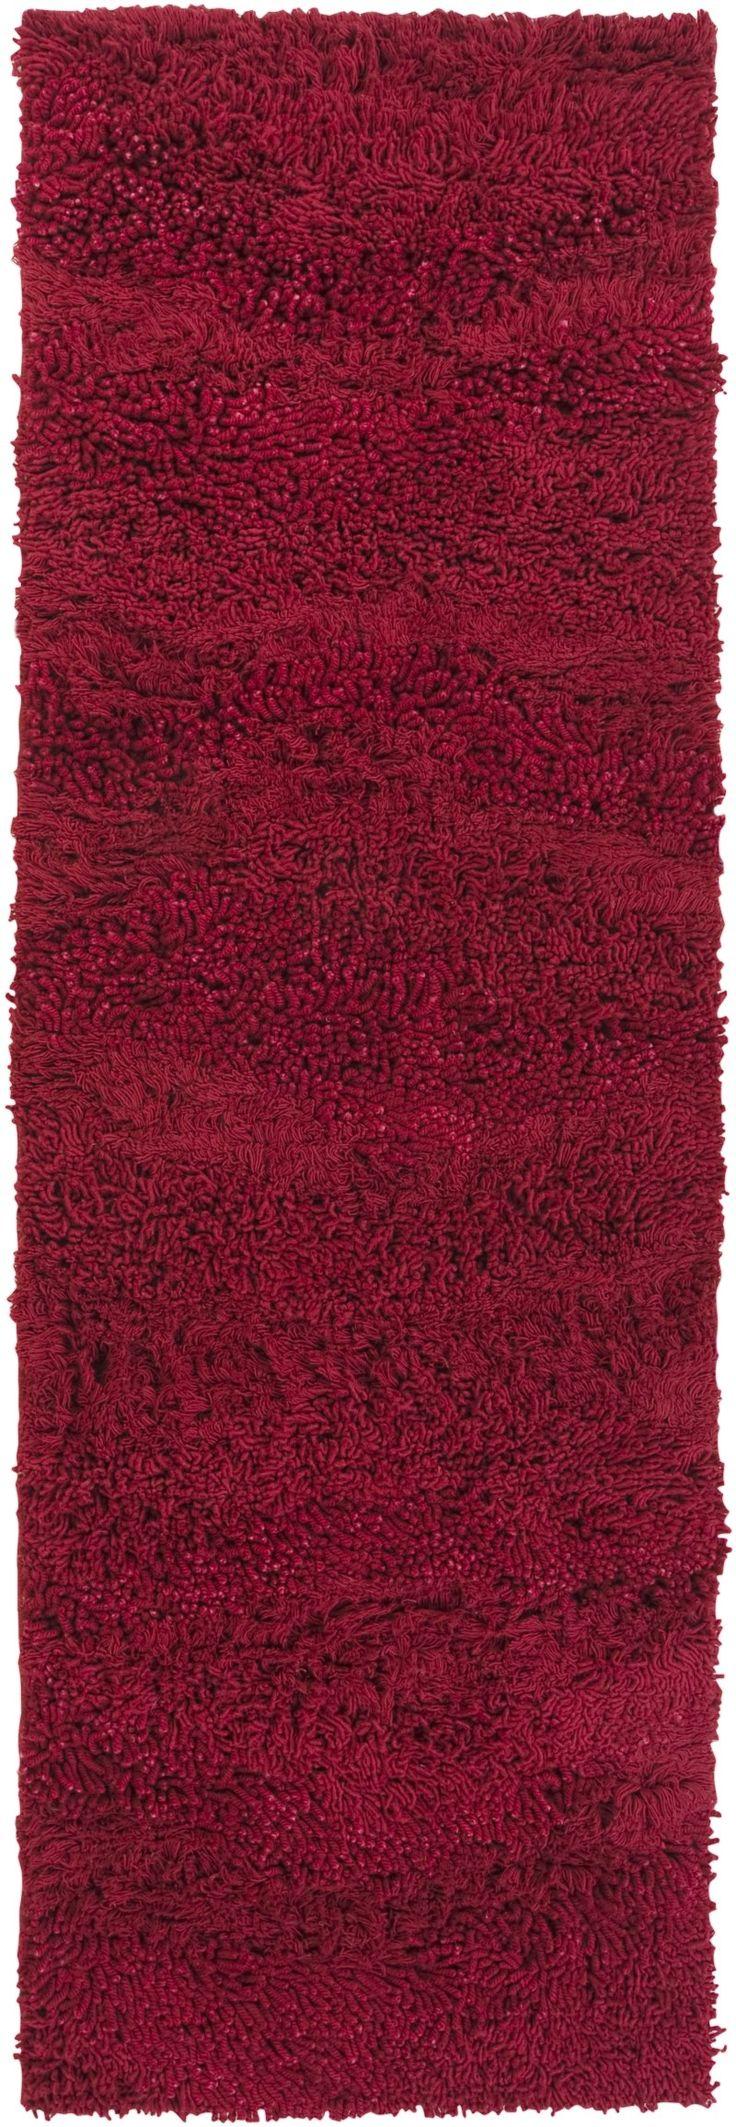 Kempton polyester area rug burgundy merlot colored 3 x3 area rugs - Kempton Polyester Area Rug Burgundy Merlot Colored 3 X3 Area Rugs Surya Berkley Brk 3301